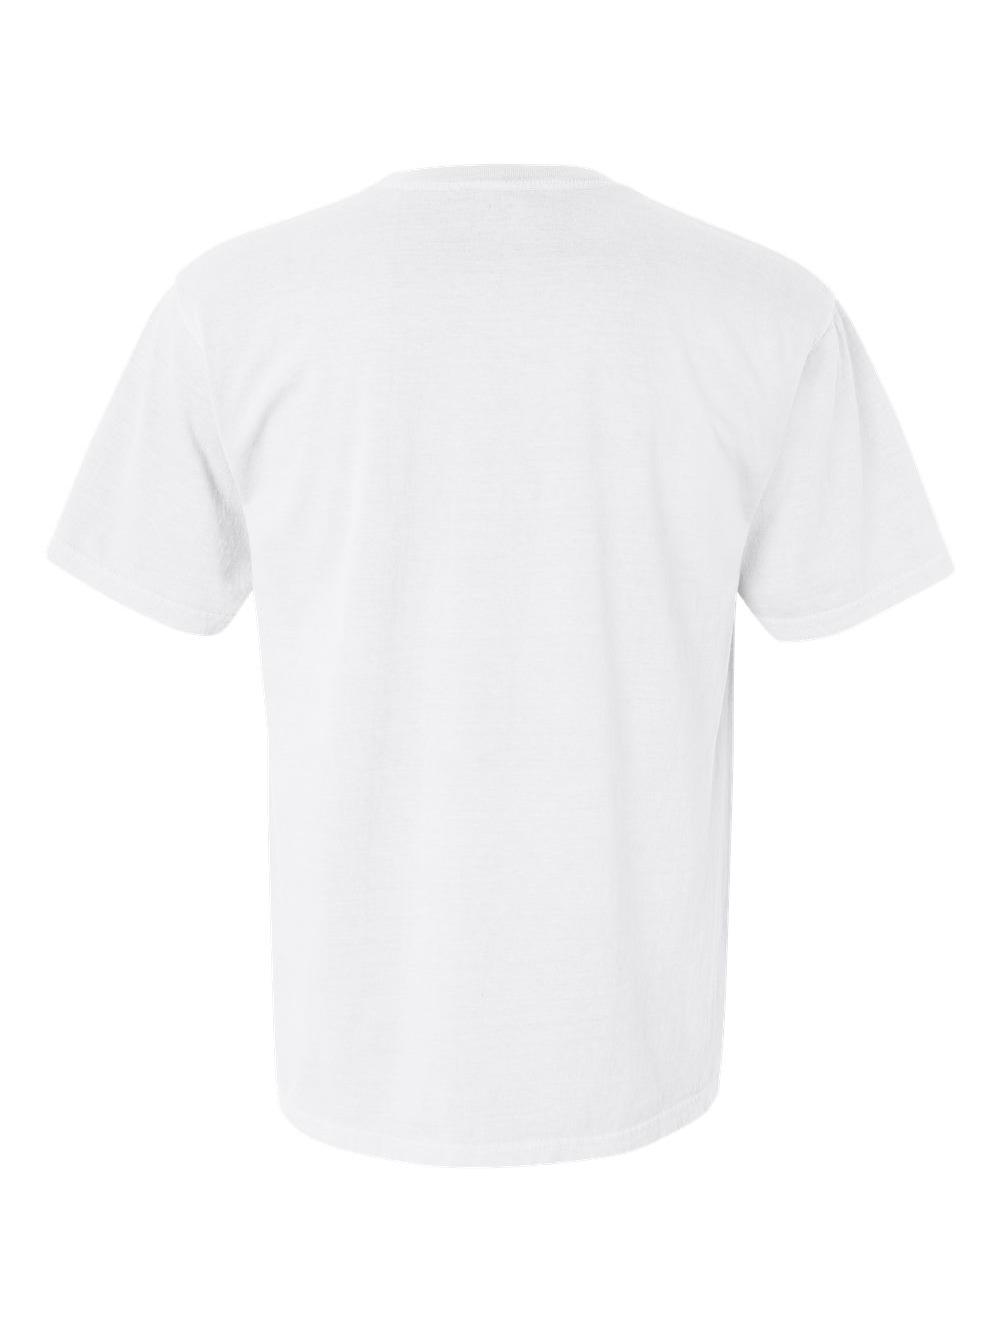 Comfort-Colors-Garment-Dyed-Heavyweight-Ringspun-Short-Sleeve-Shirt-1717 thumbnail 130